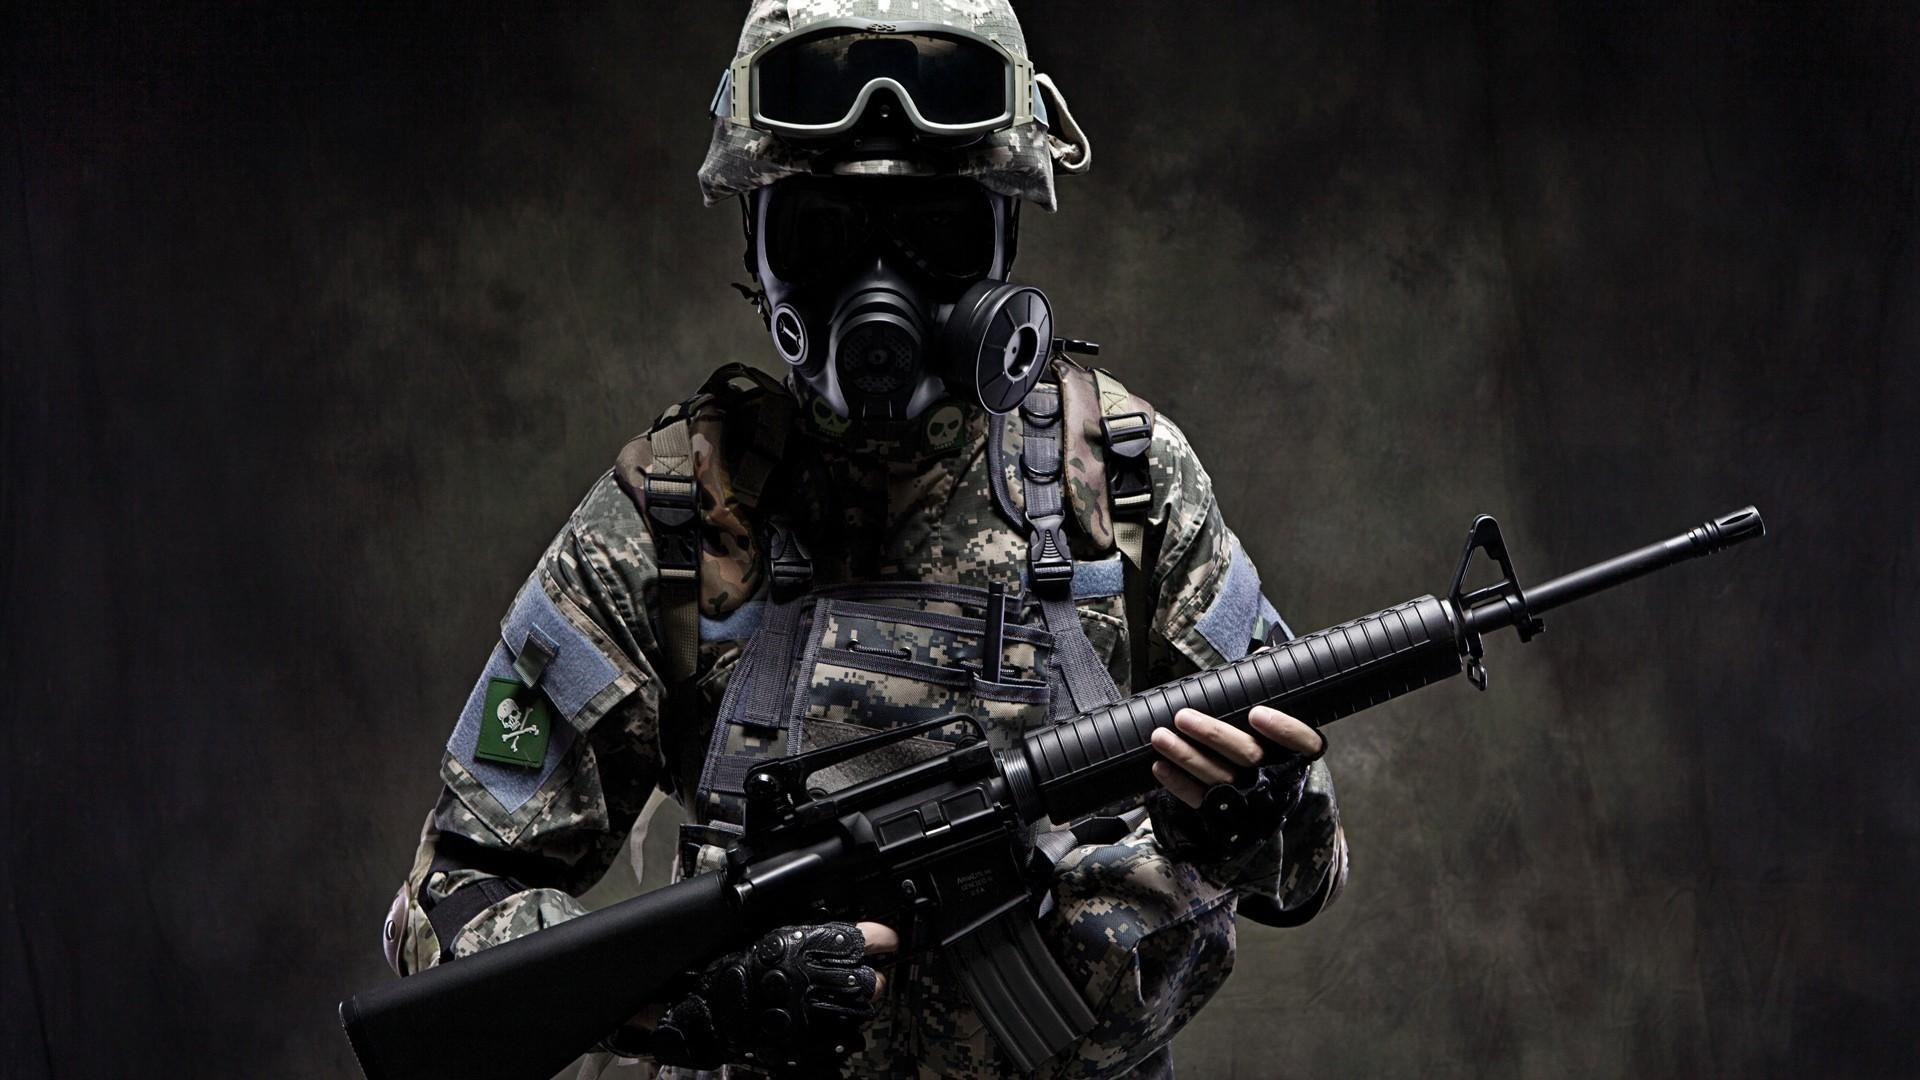 Res: 1920x1080, WATCH-Wednesday-Jihadi-Bitch-Slaying-Cobra-Gunships-JDAM-